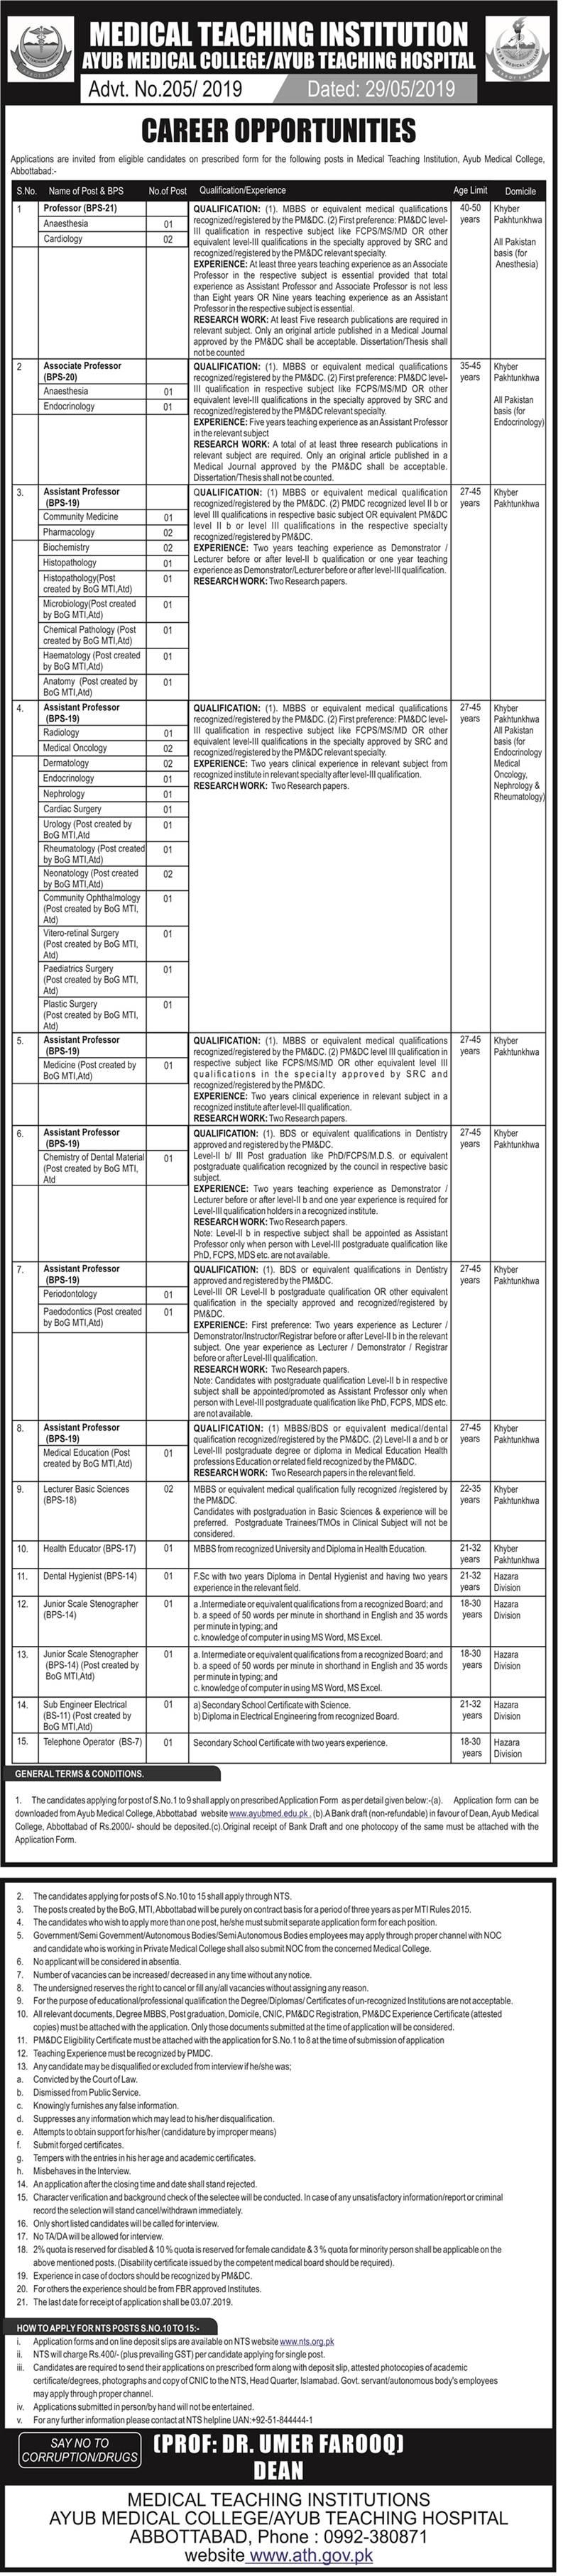 Ayub Teaching Hospital Abbottabad NTS Jobs 2019 Application form Eligibility Criteria